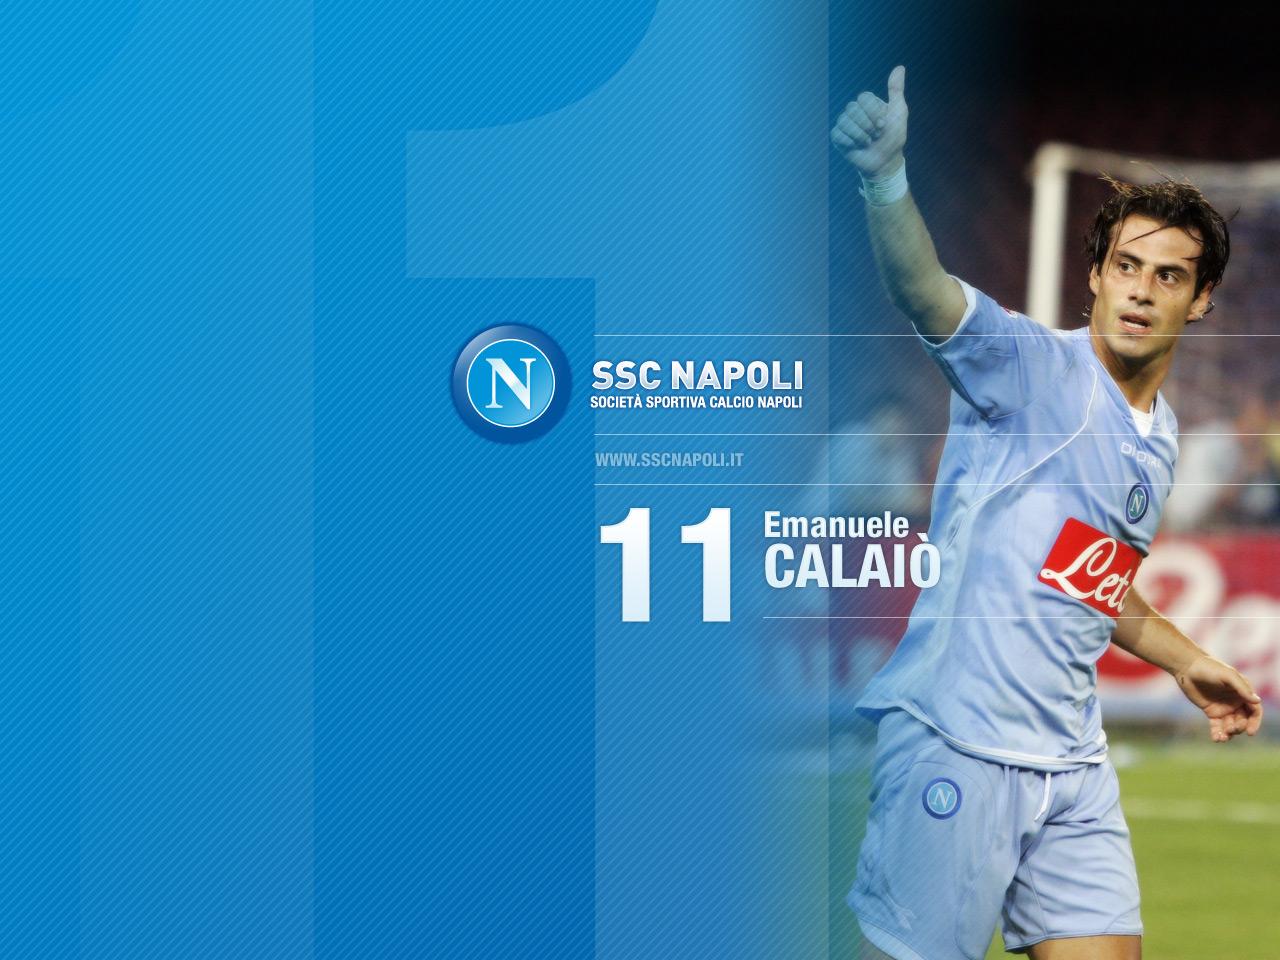 2011 Emanuele Calaiò Wallpaper | CHAMPIONCUP|Wallpaper ...